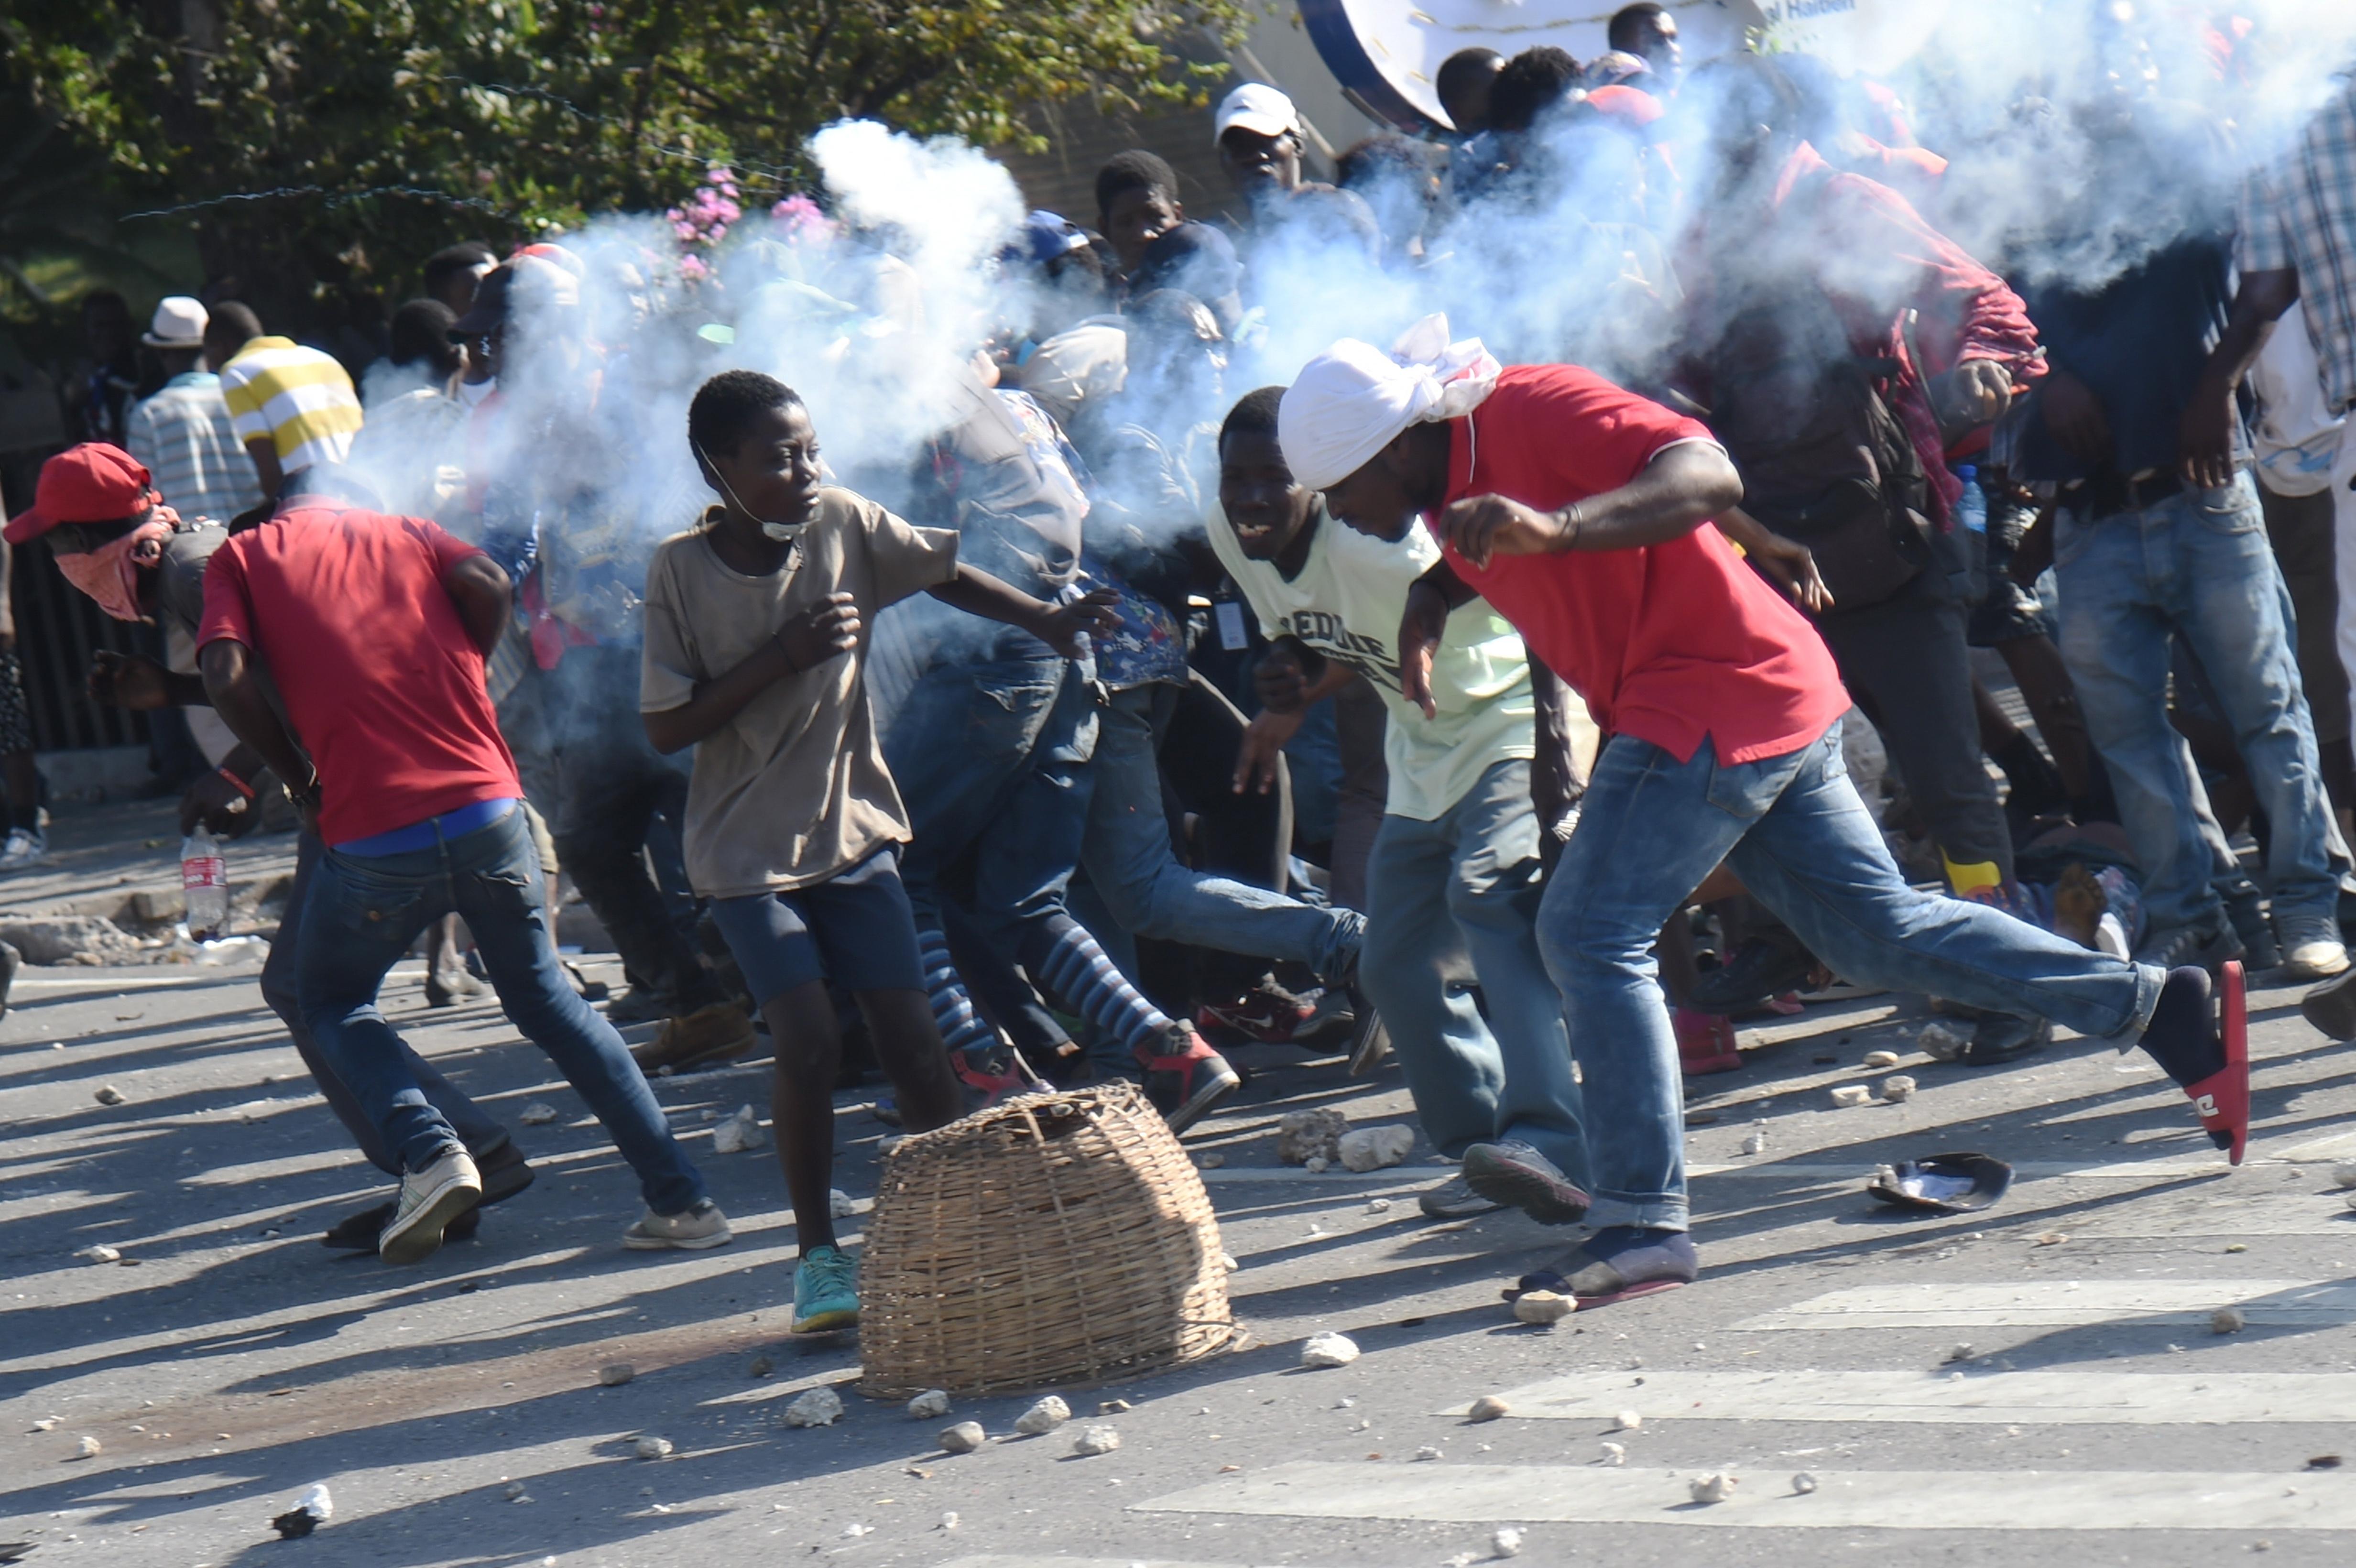 Protesters run as police fire tear gas in Port-au-Prince, Haiti, on Feb. 13.